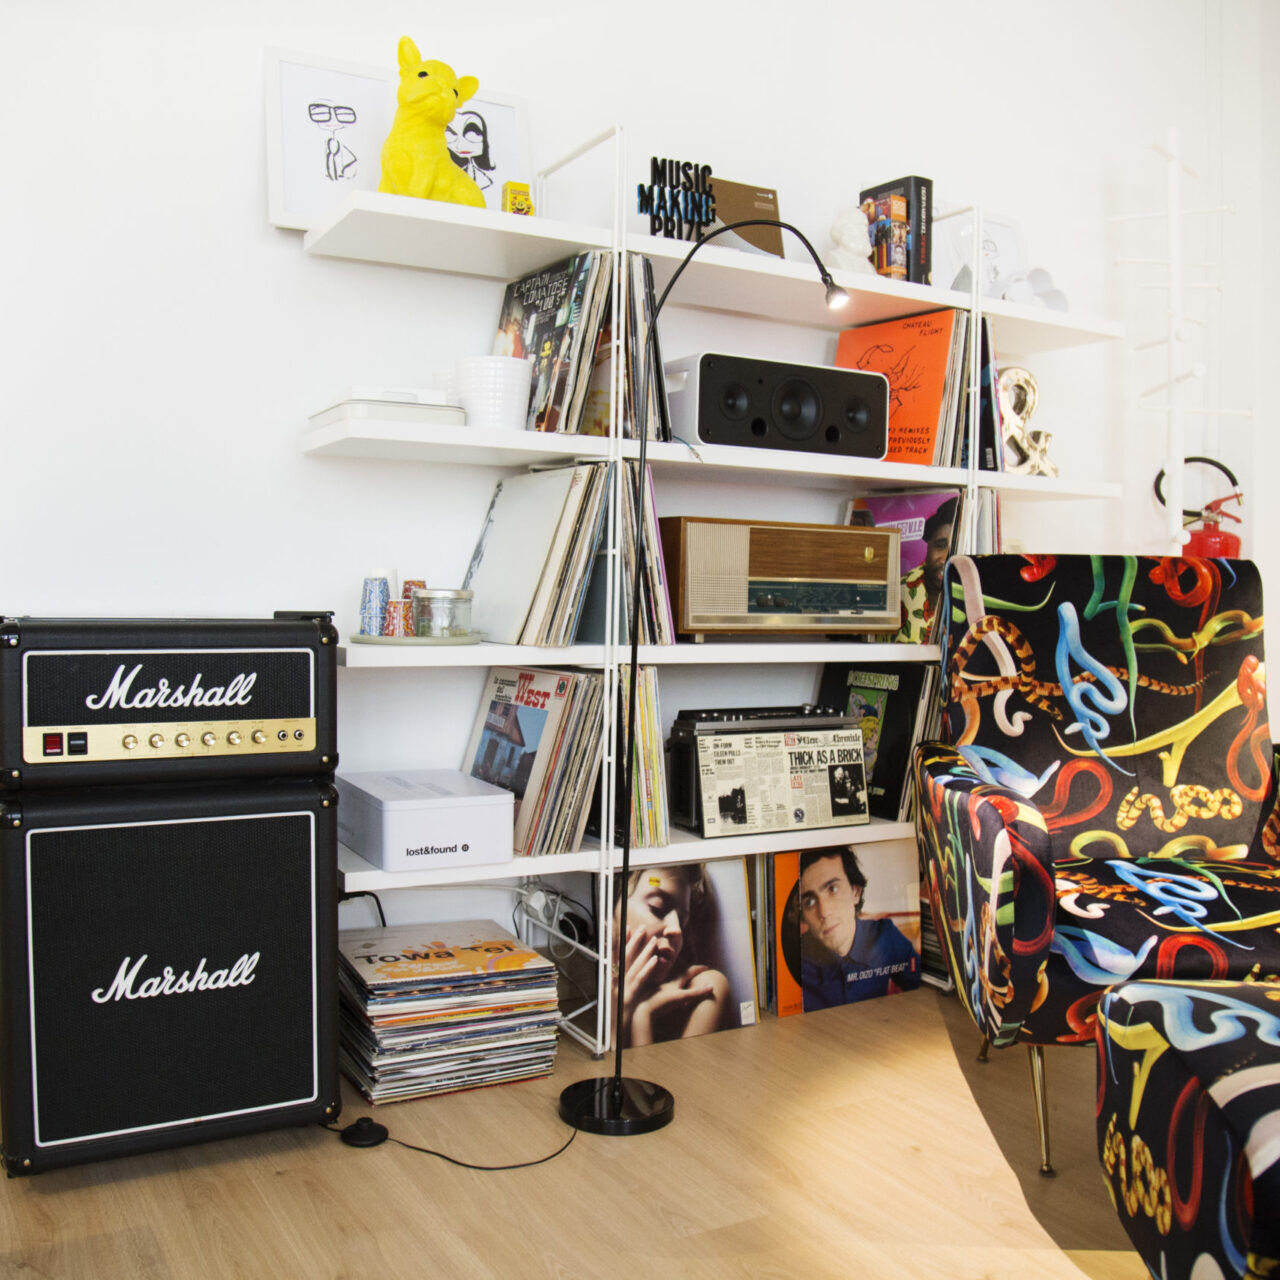 jackleg studio sound design milano